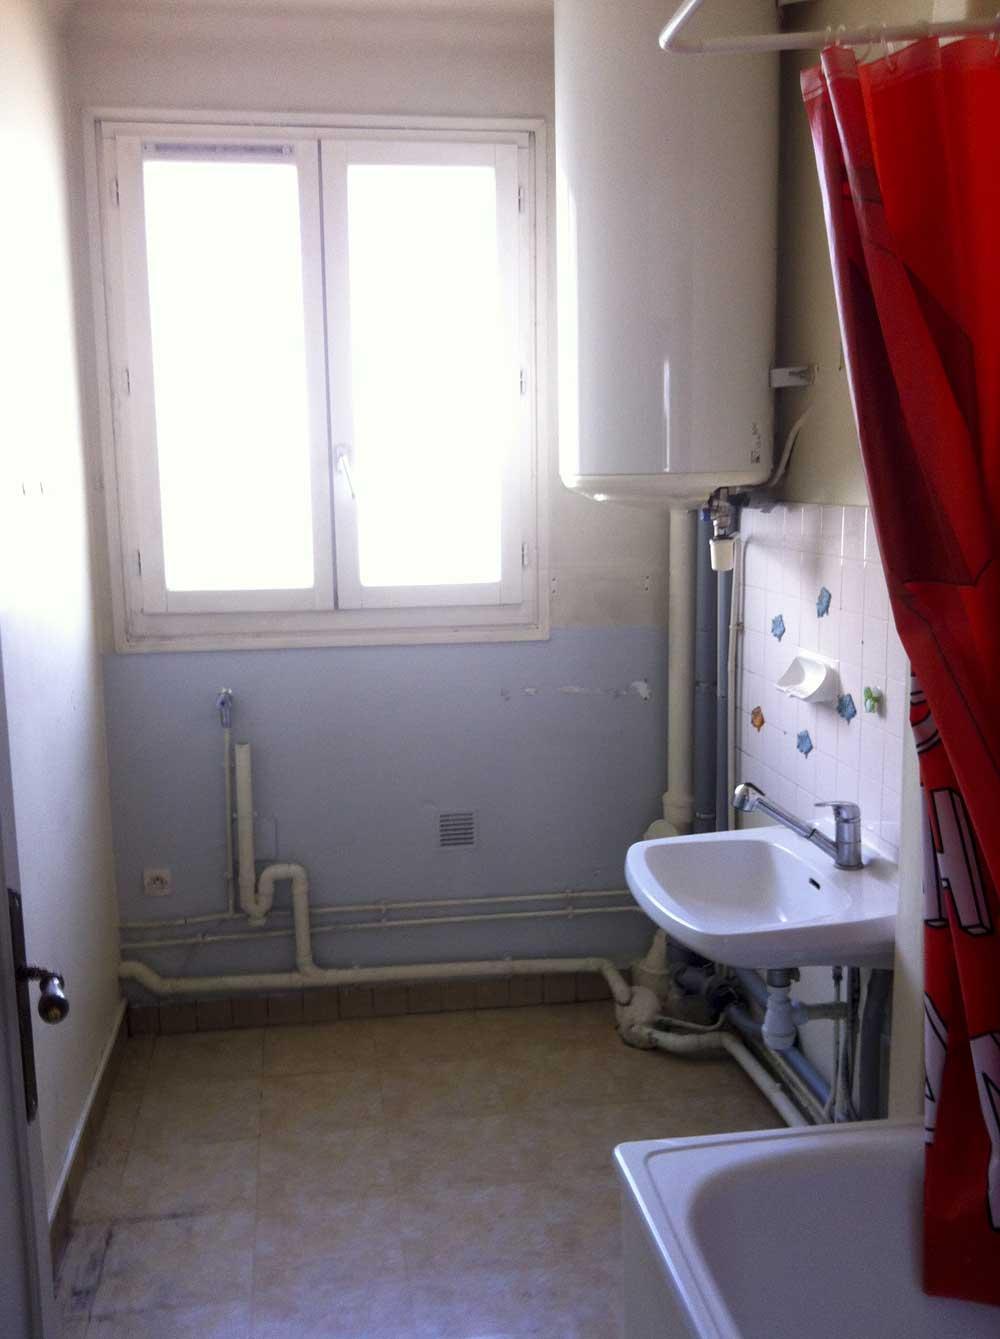 Salle de bains r nover paris for Renover une petite salle de bain